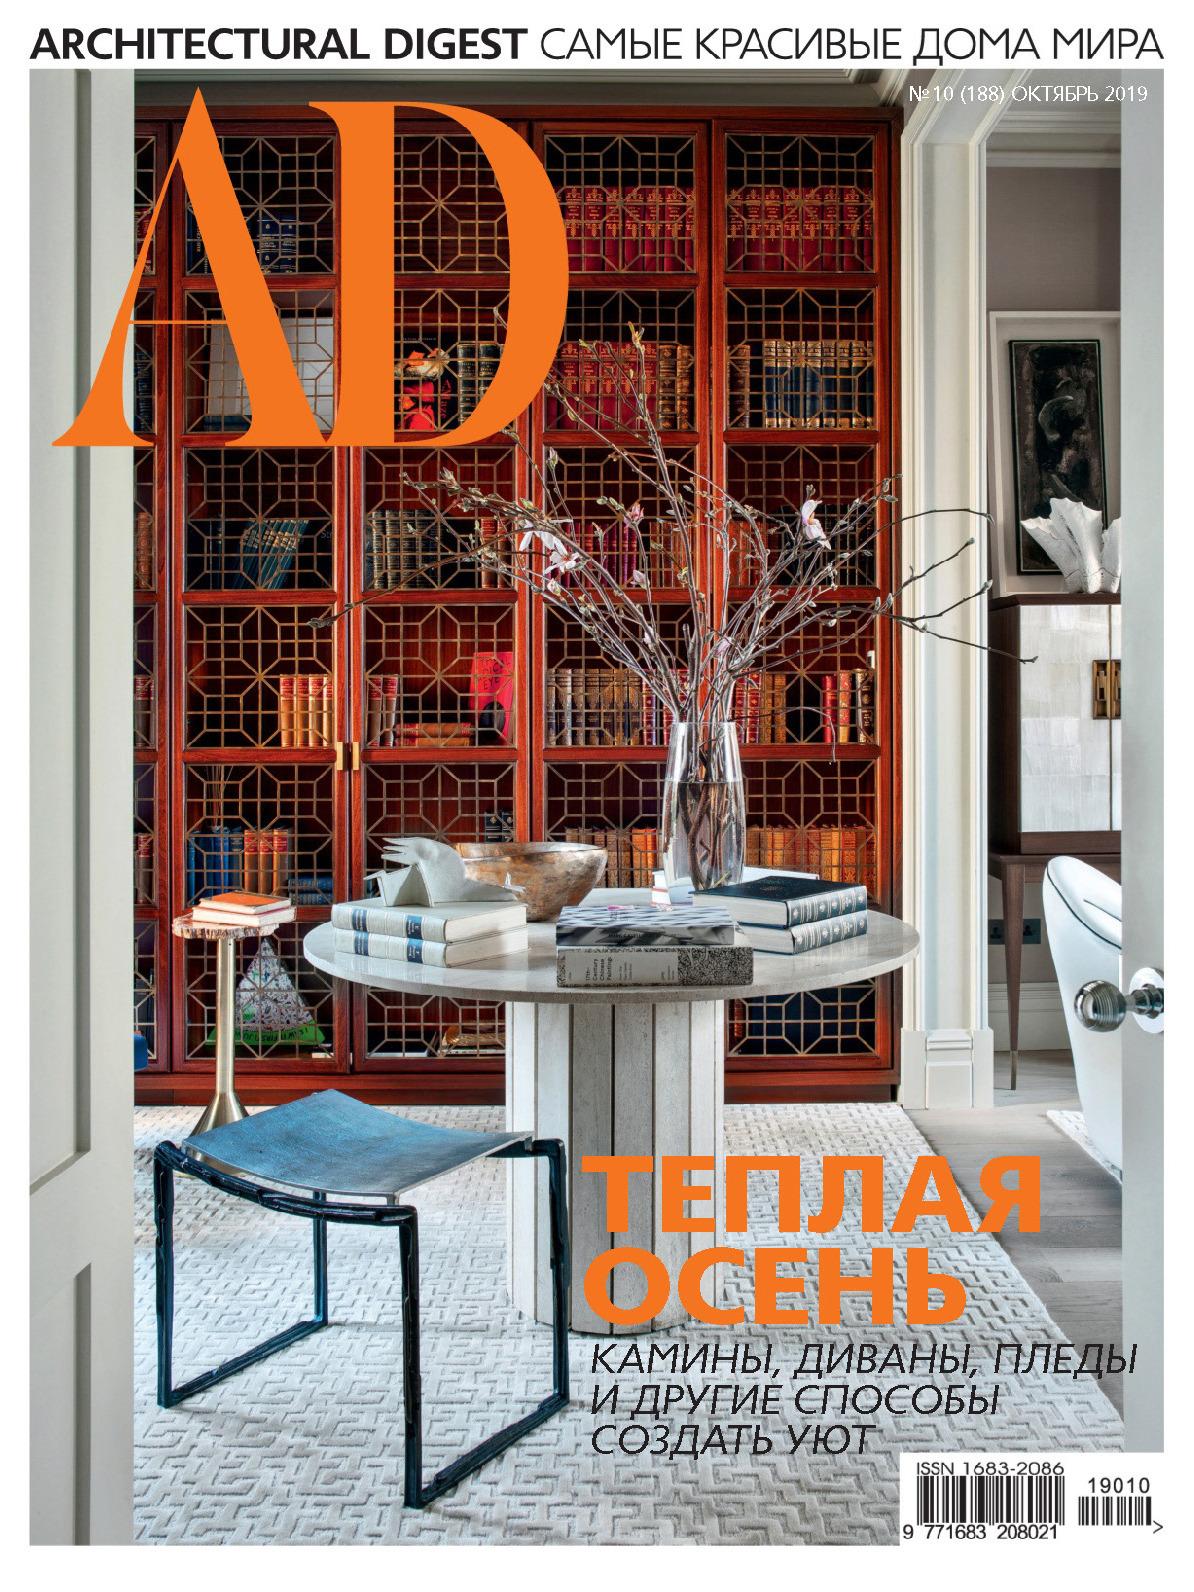 《AD》俄罗斯版室内室外设计杂志2019年10月号